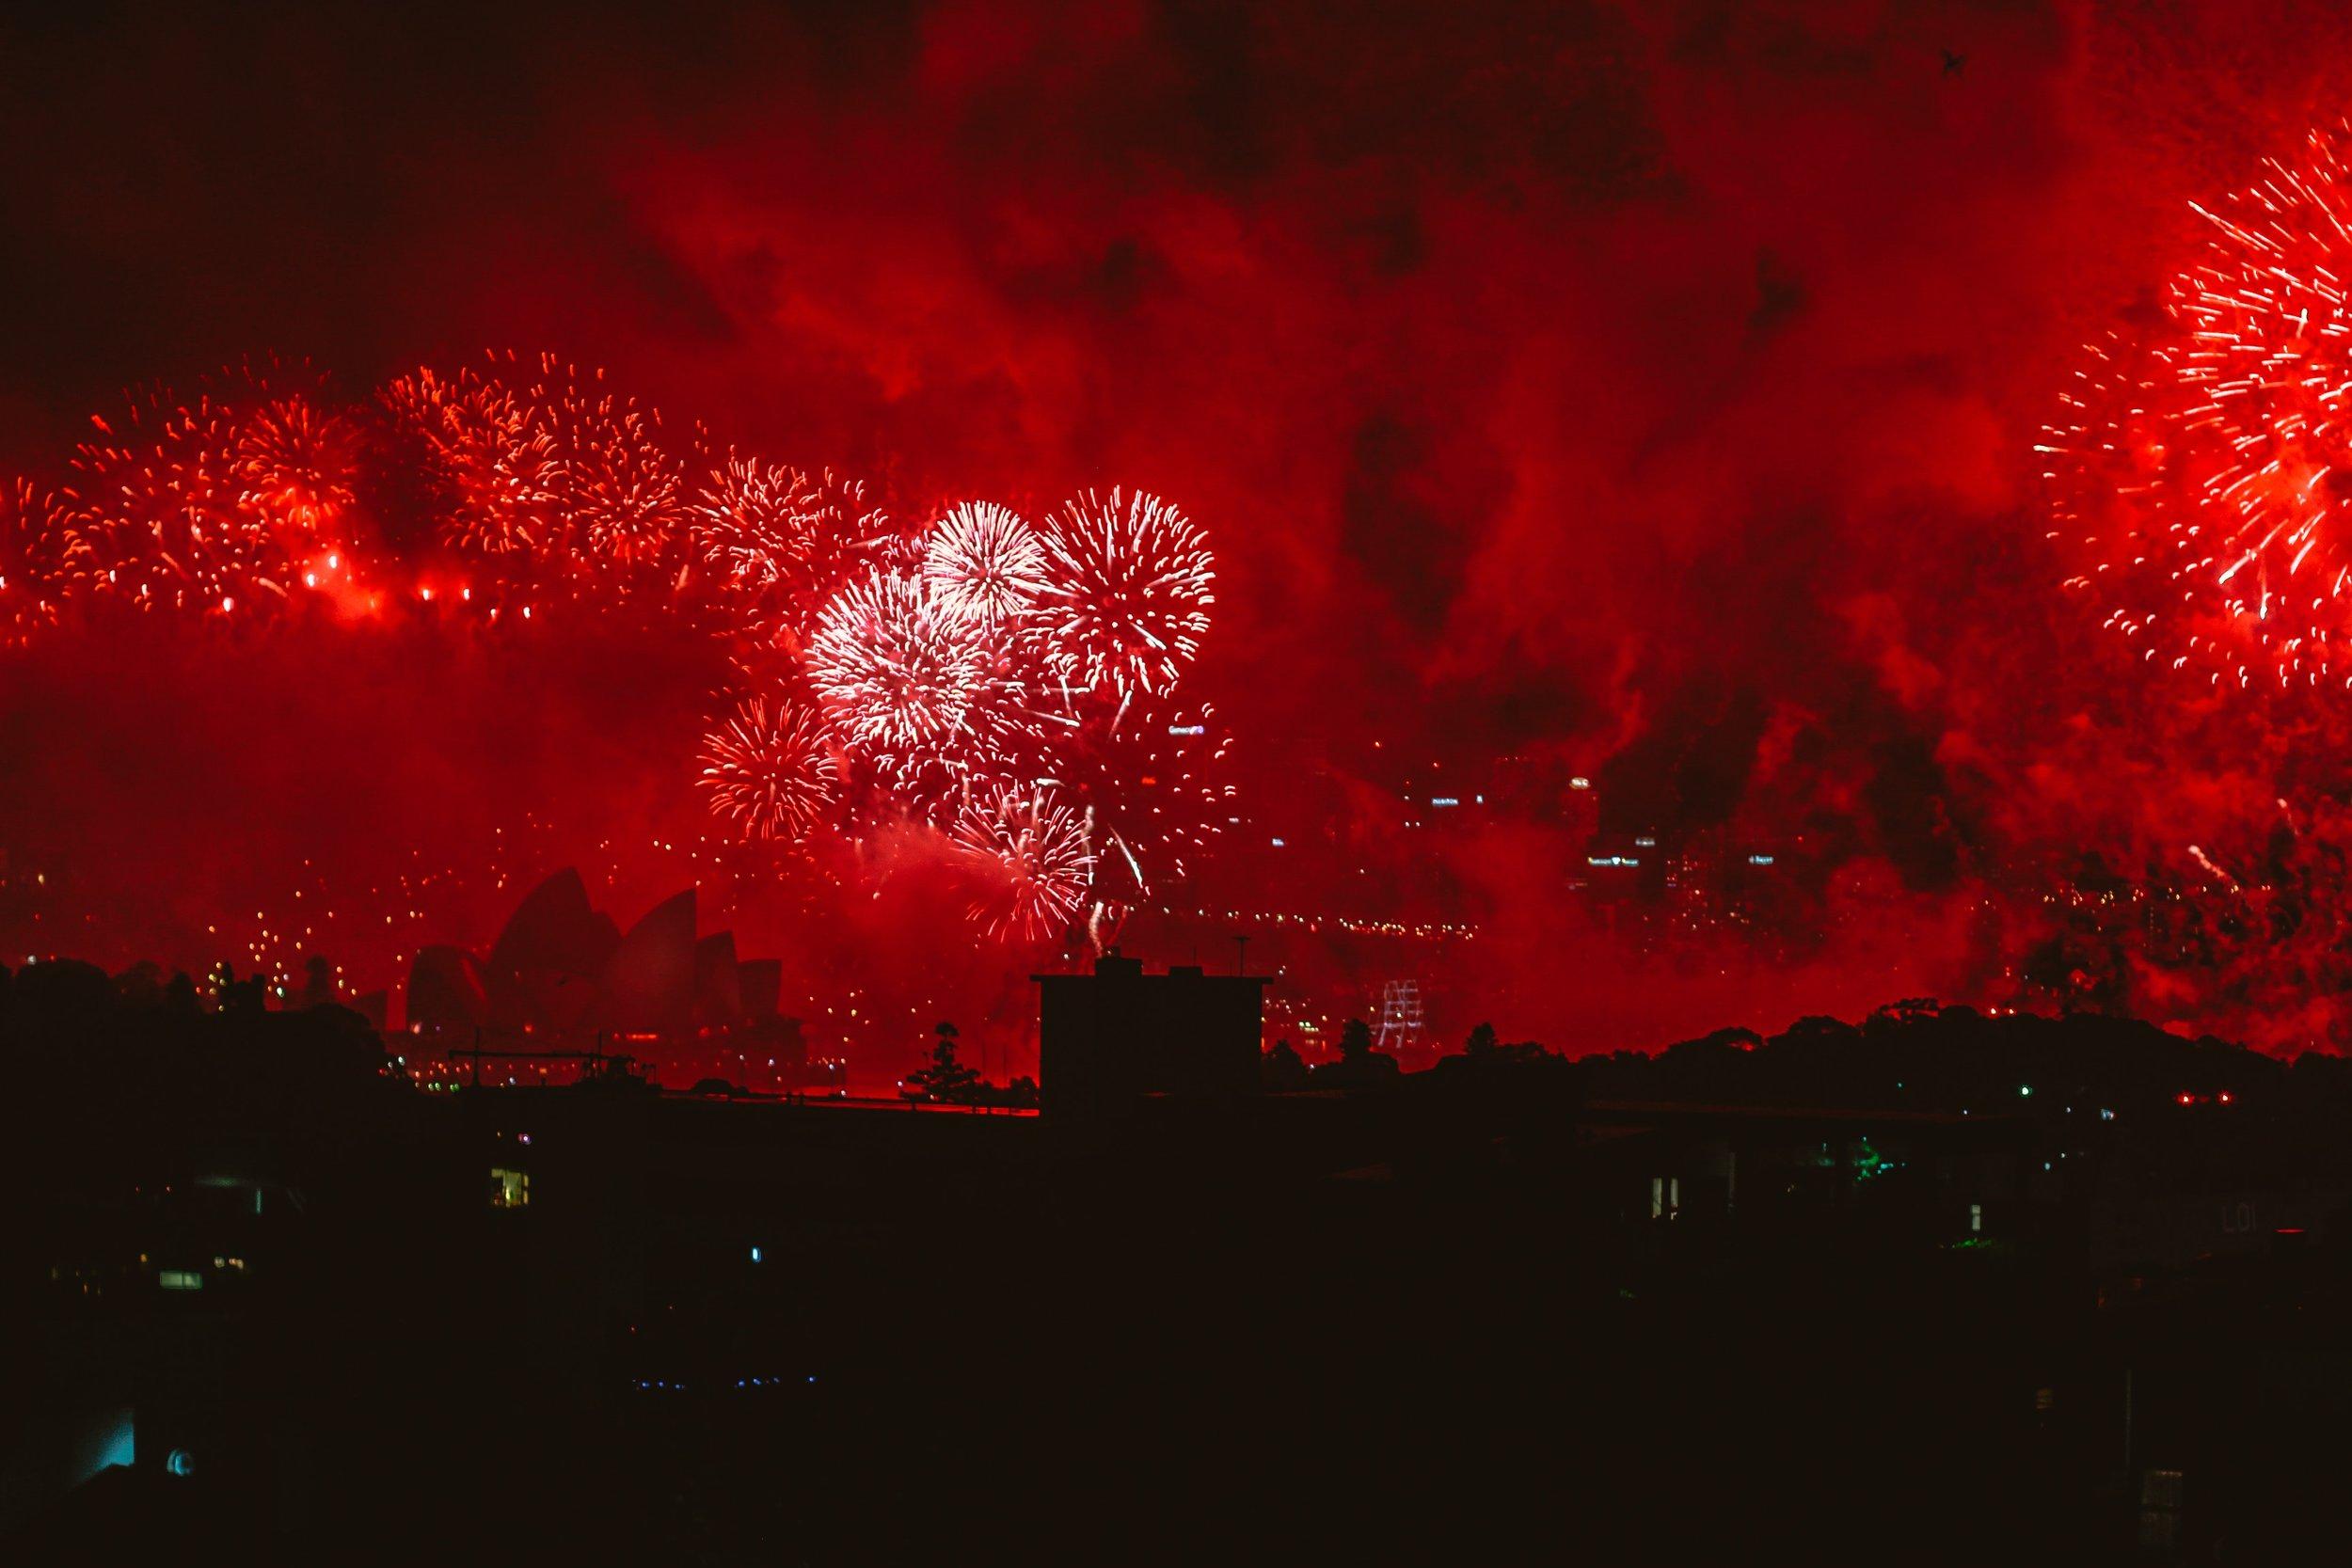 bright-celebration-evening-799964.jpg